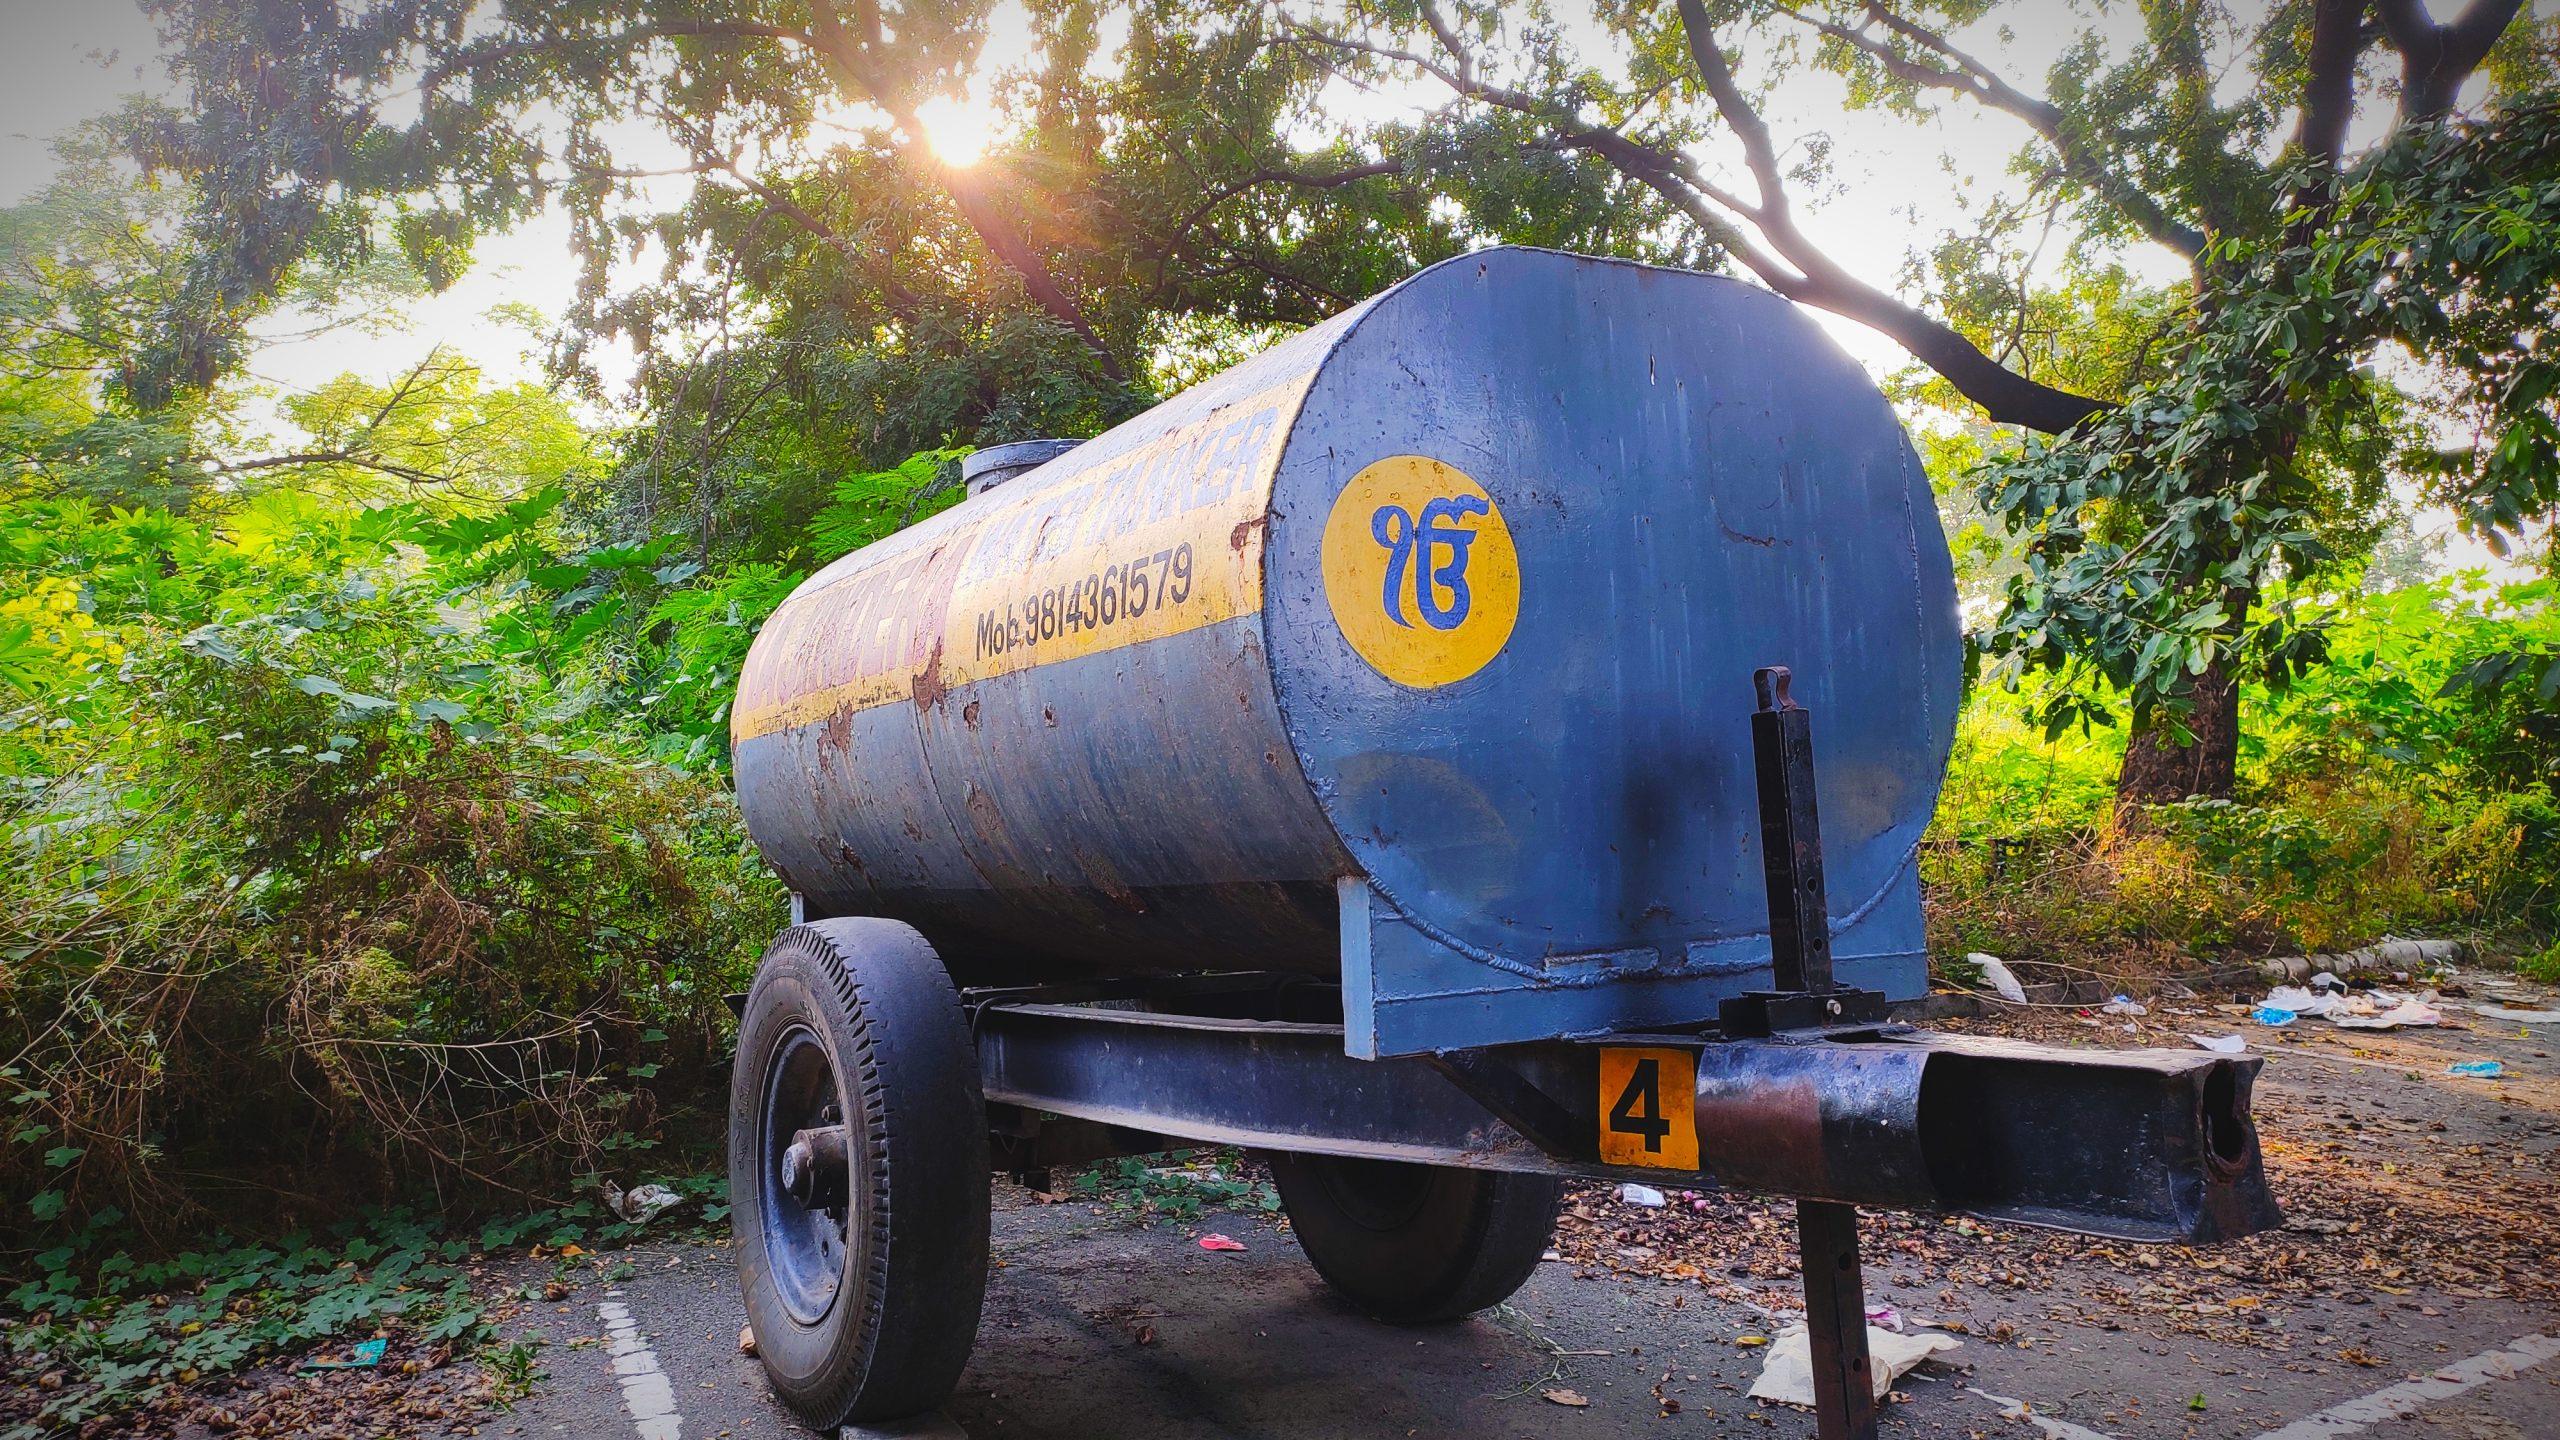 Water tanker vehicle